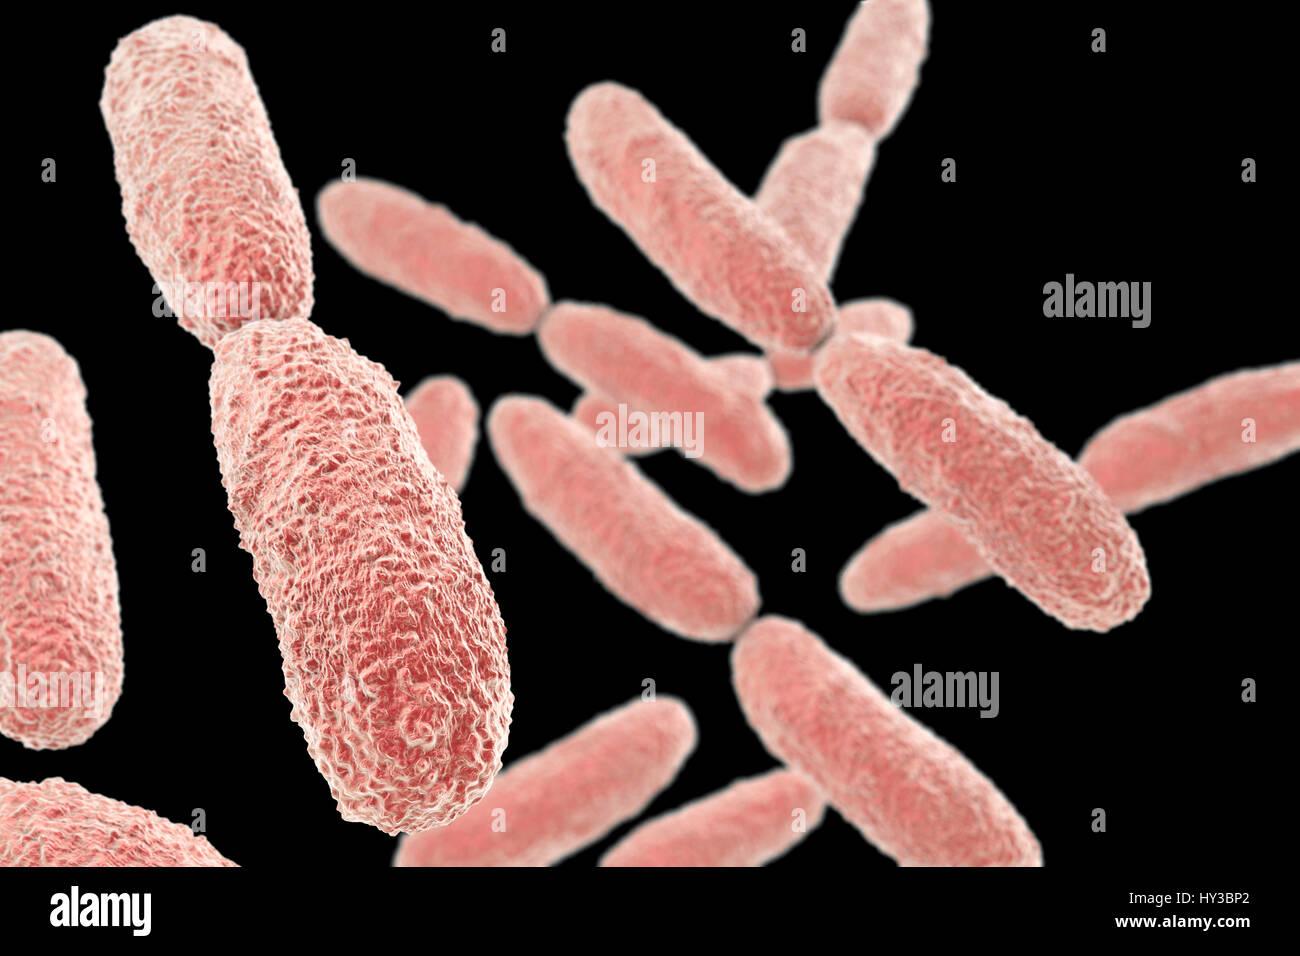 Klebsiella pneumoniae bacteria,computer illustration.K.pneumoniae are Gram-negative,encapsulated,non-motile,enteric,rod - Stock Image